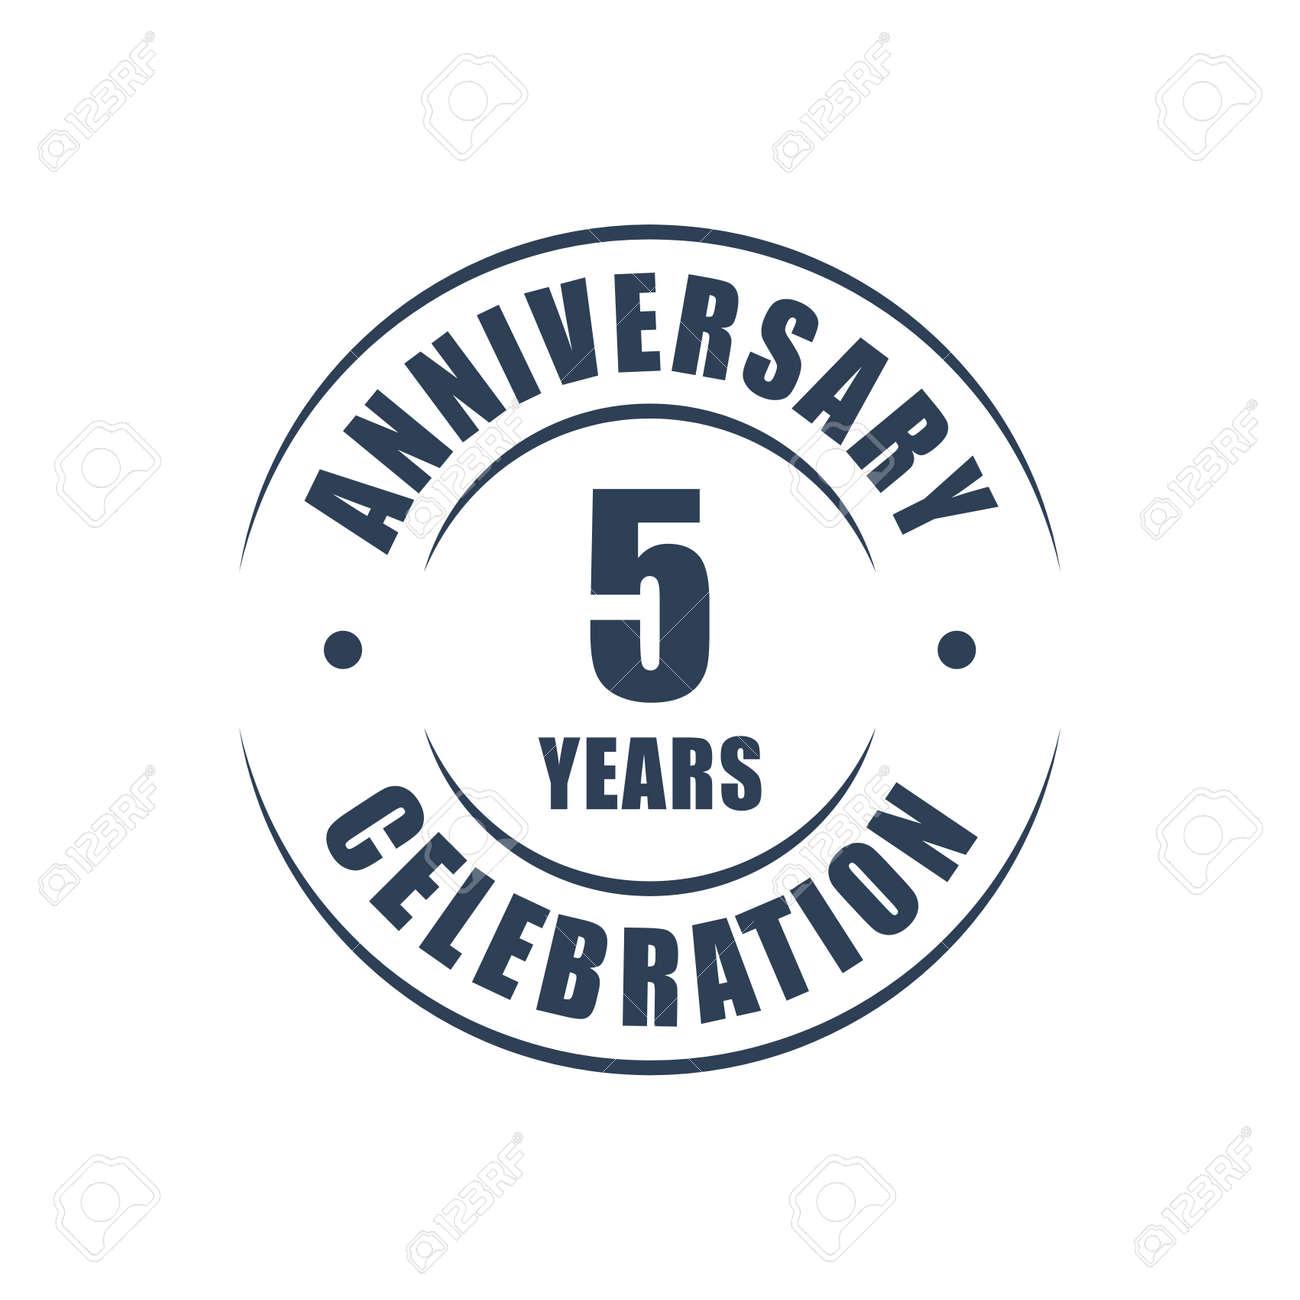 5 years anniversary celebration logo royalty free cliparts 5 years anniversary celebration logo stock vector 65016182 biocorpaavc Gallery